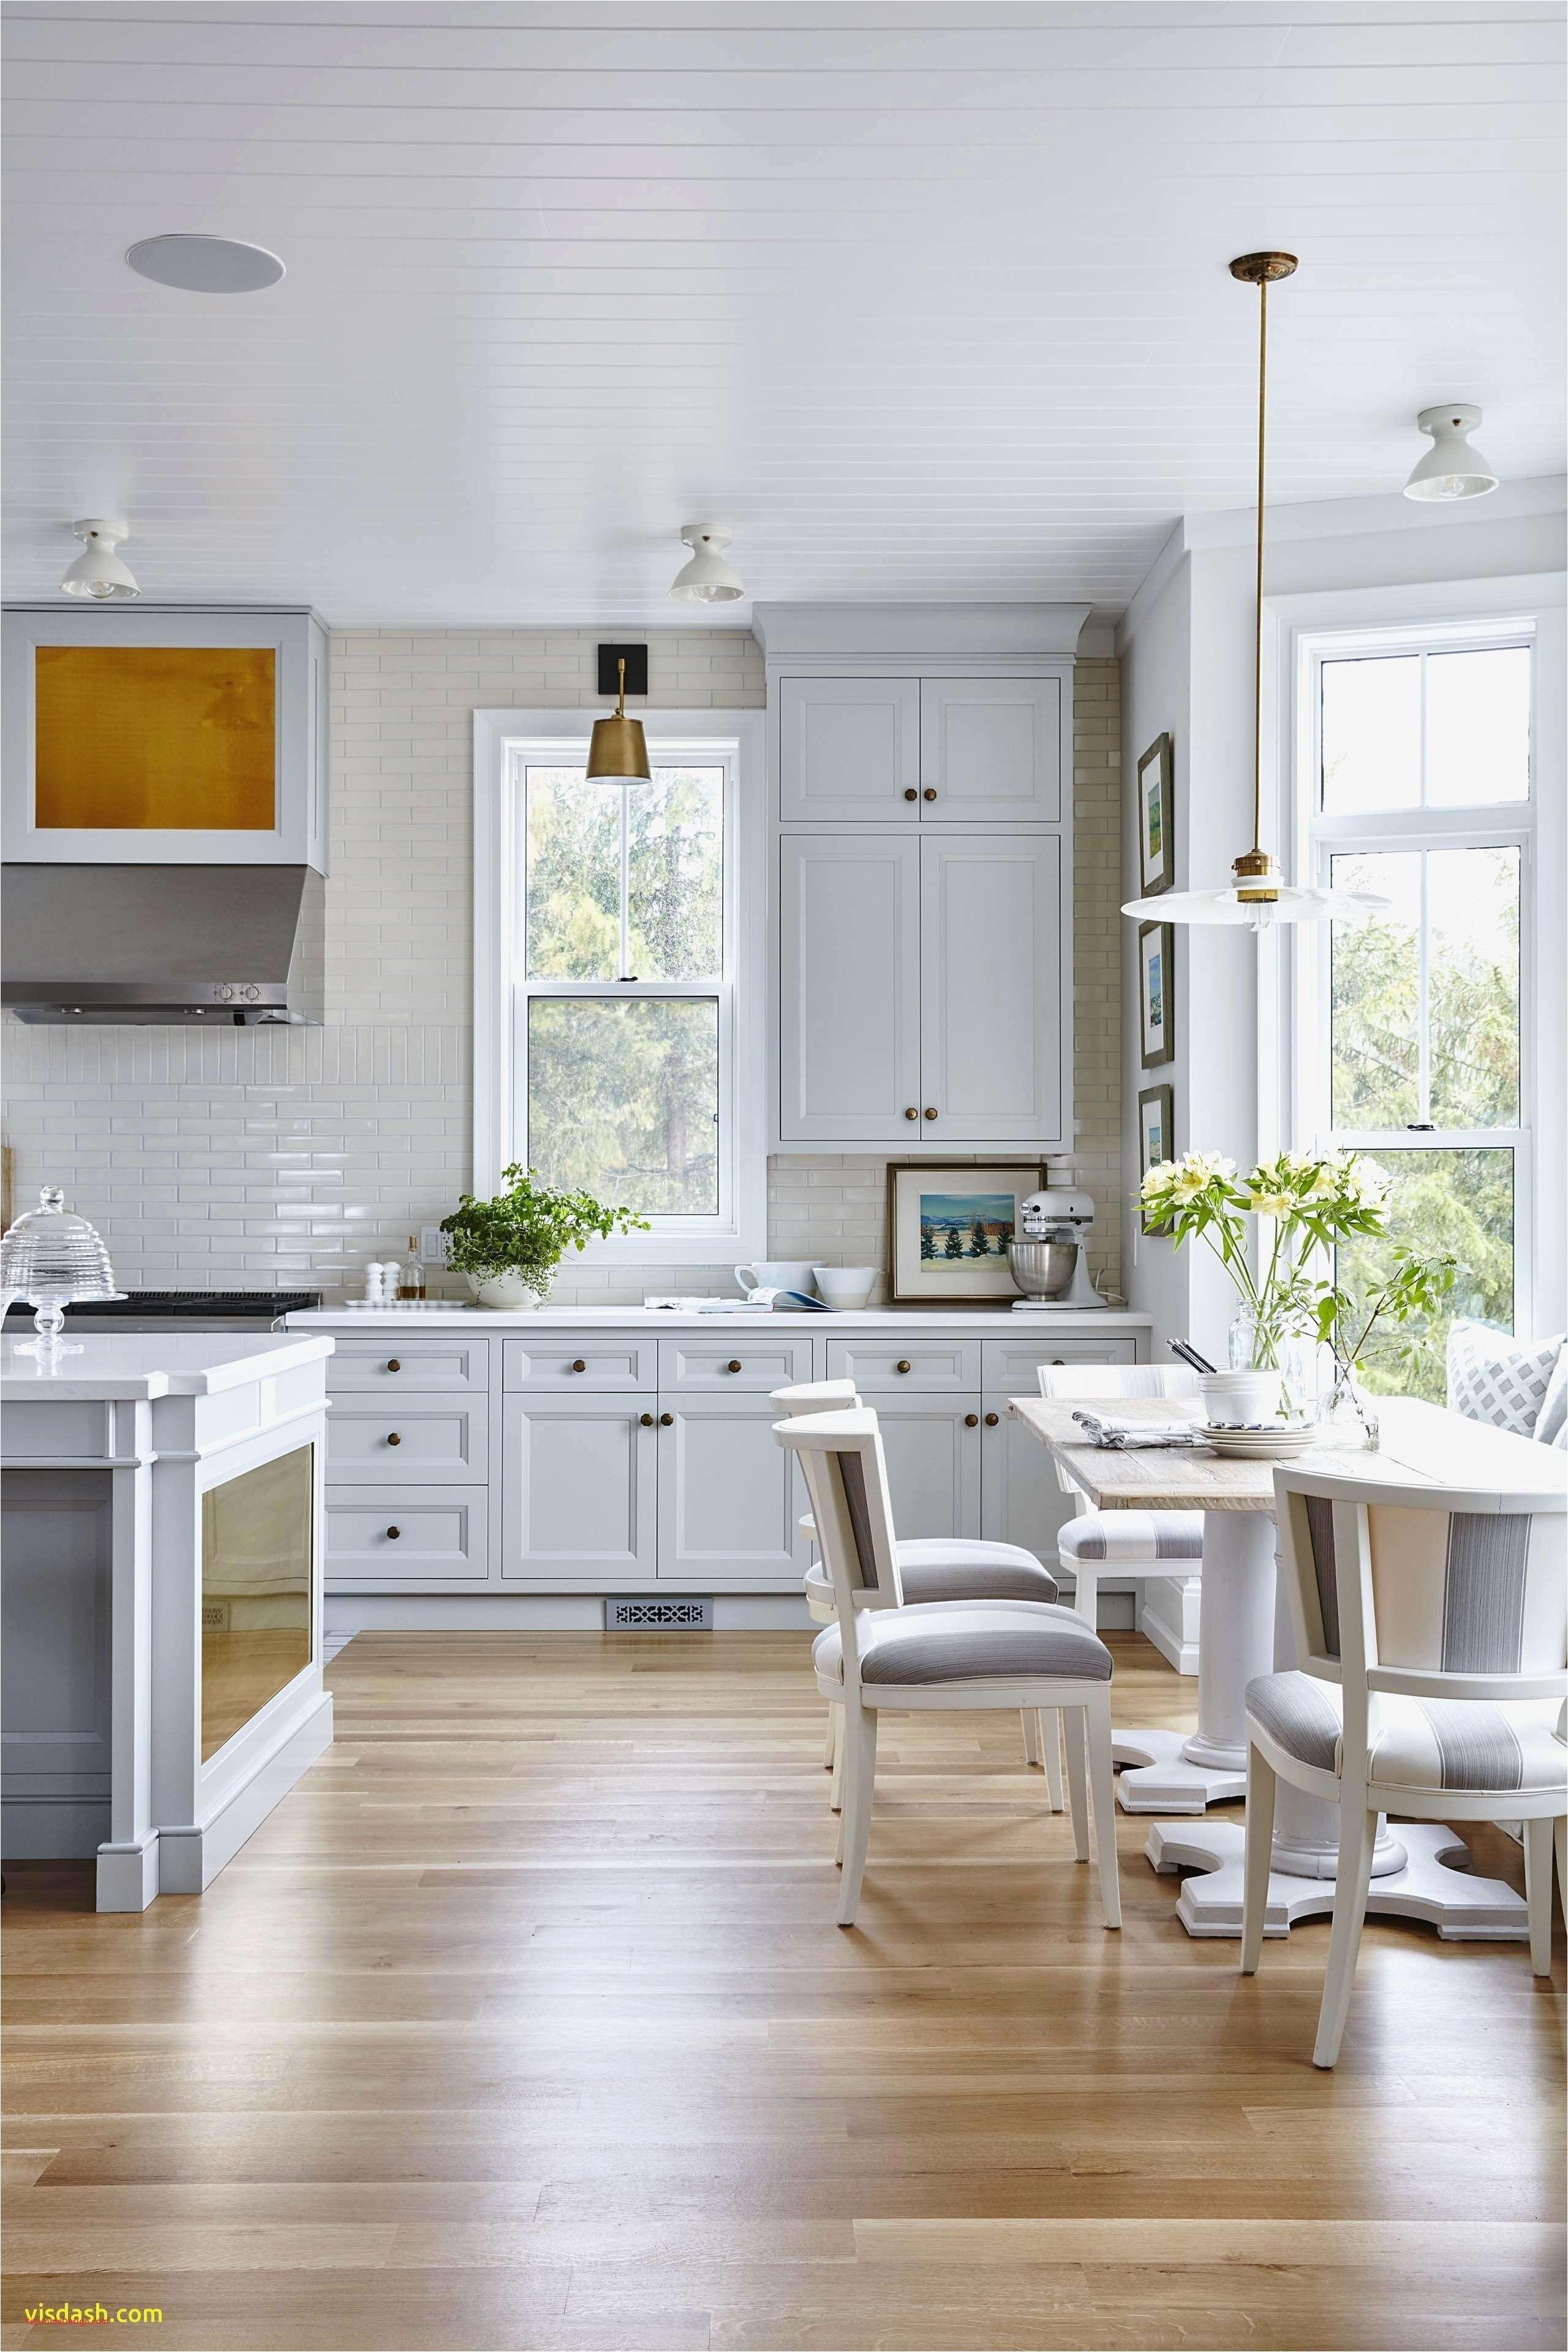 Home Tile Design Ideas Valid Floor Tiles Mosaic Bathroom 0d New Bathroom Floor Tiles Home